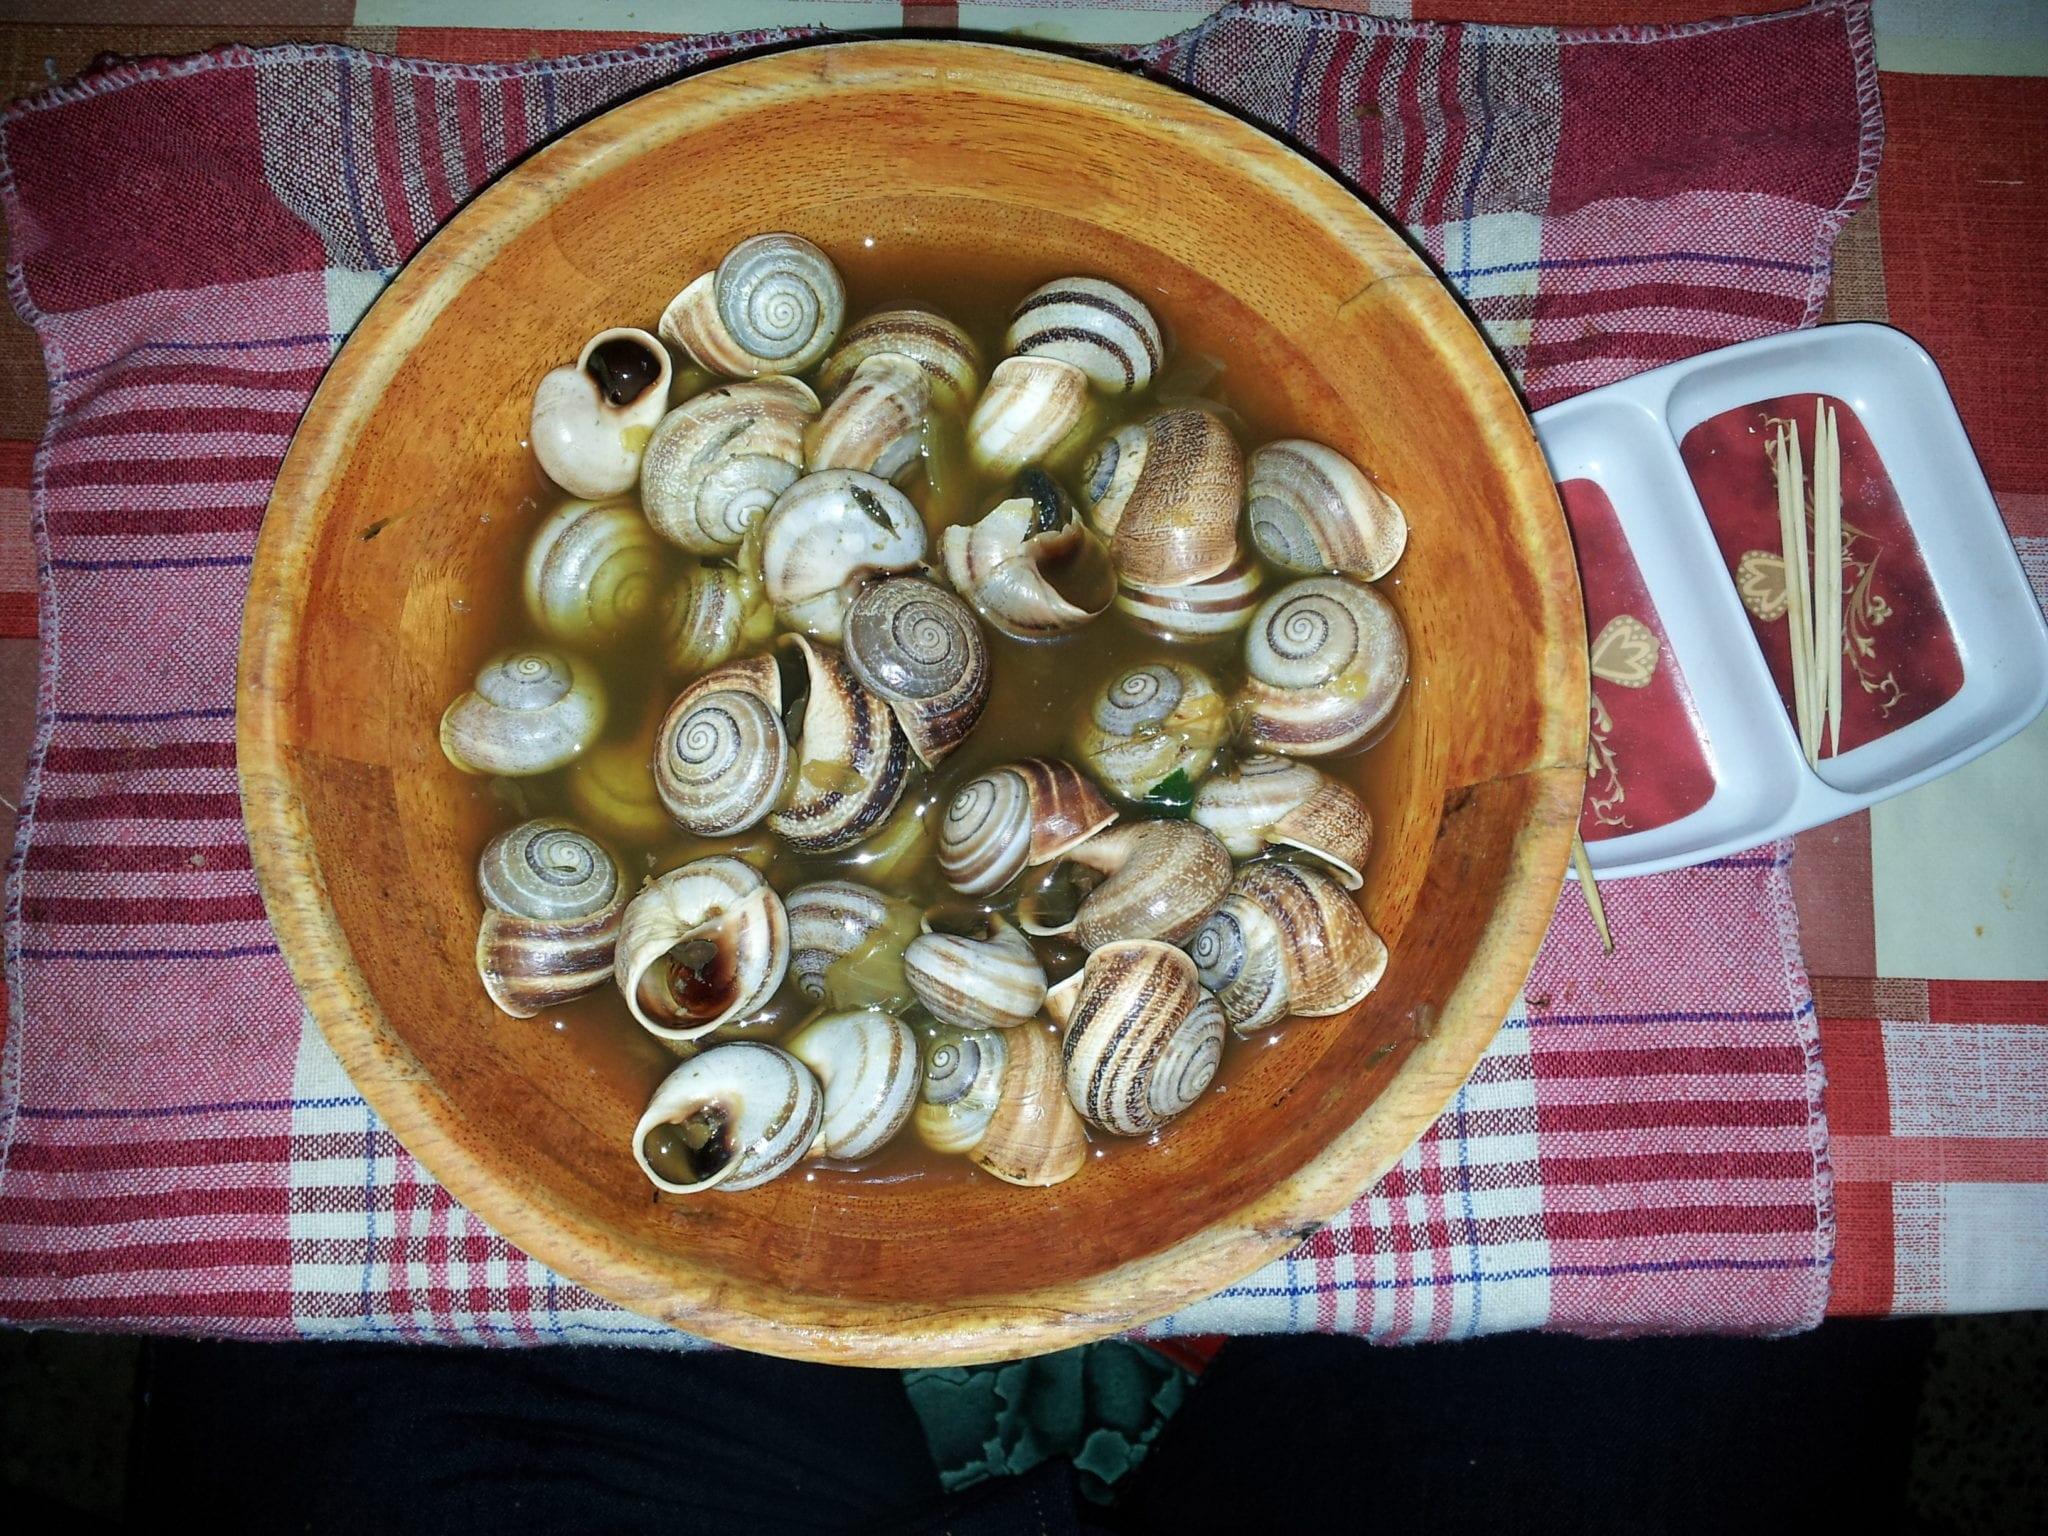 Spicy snails dish | © Dyolf77/Wikipedia